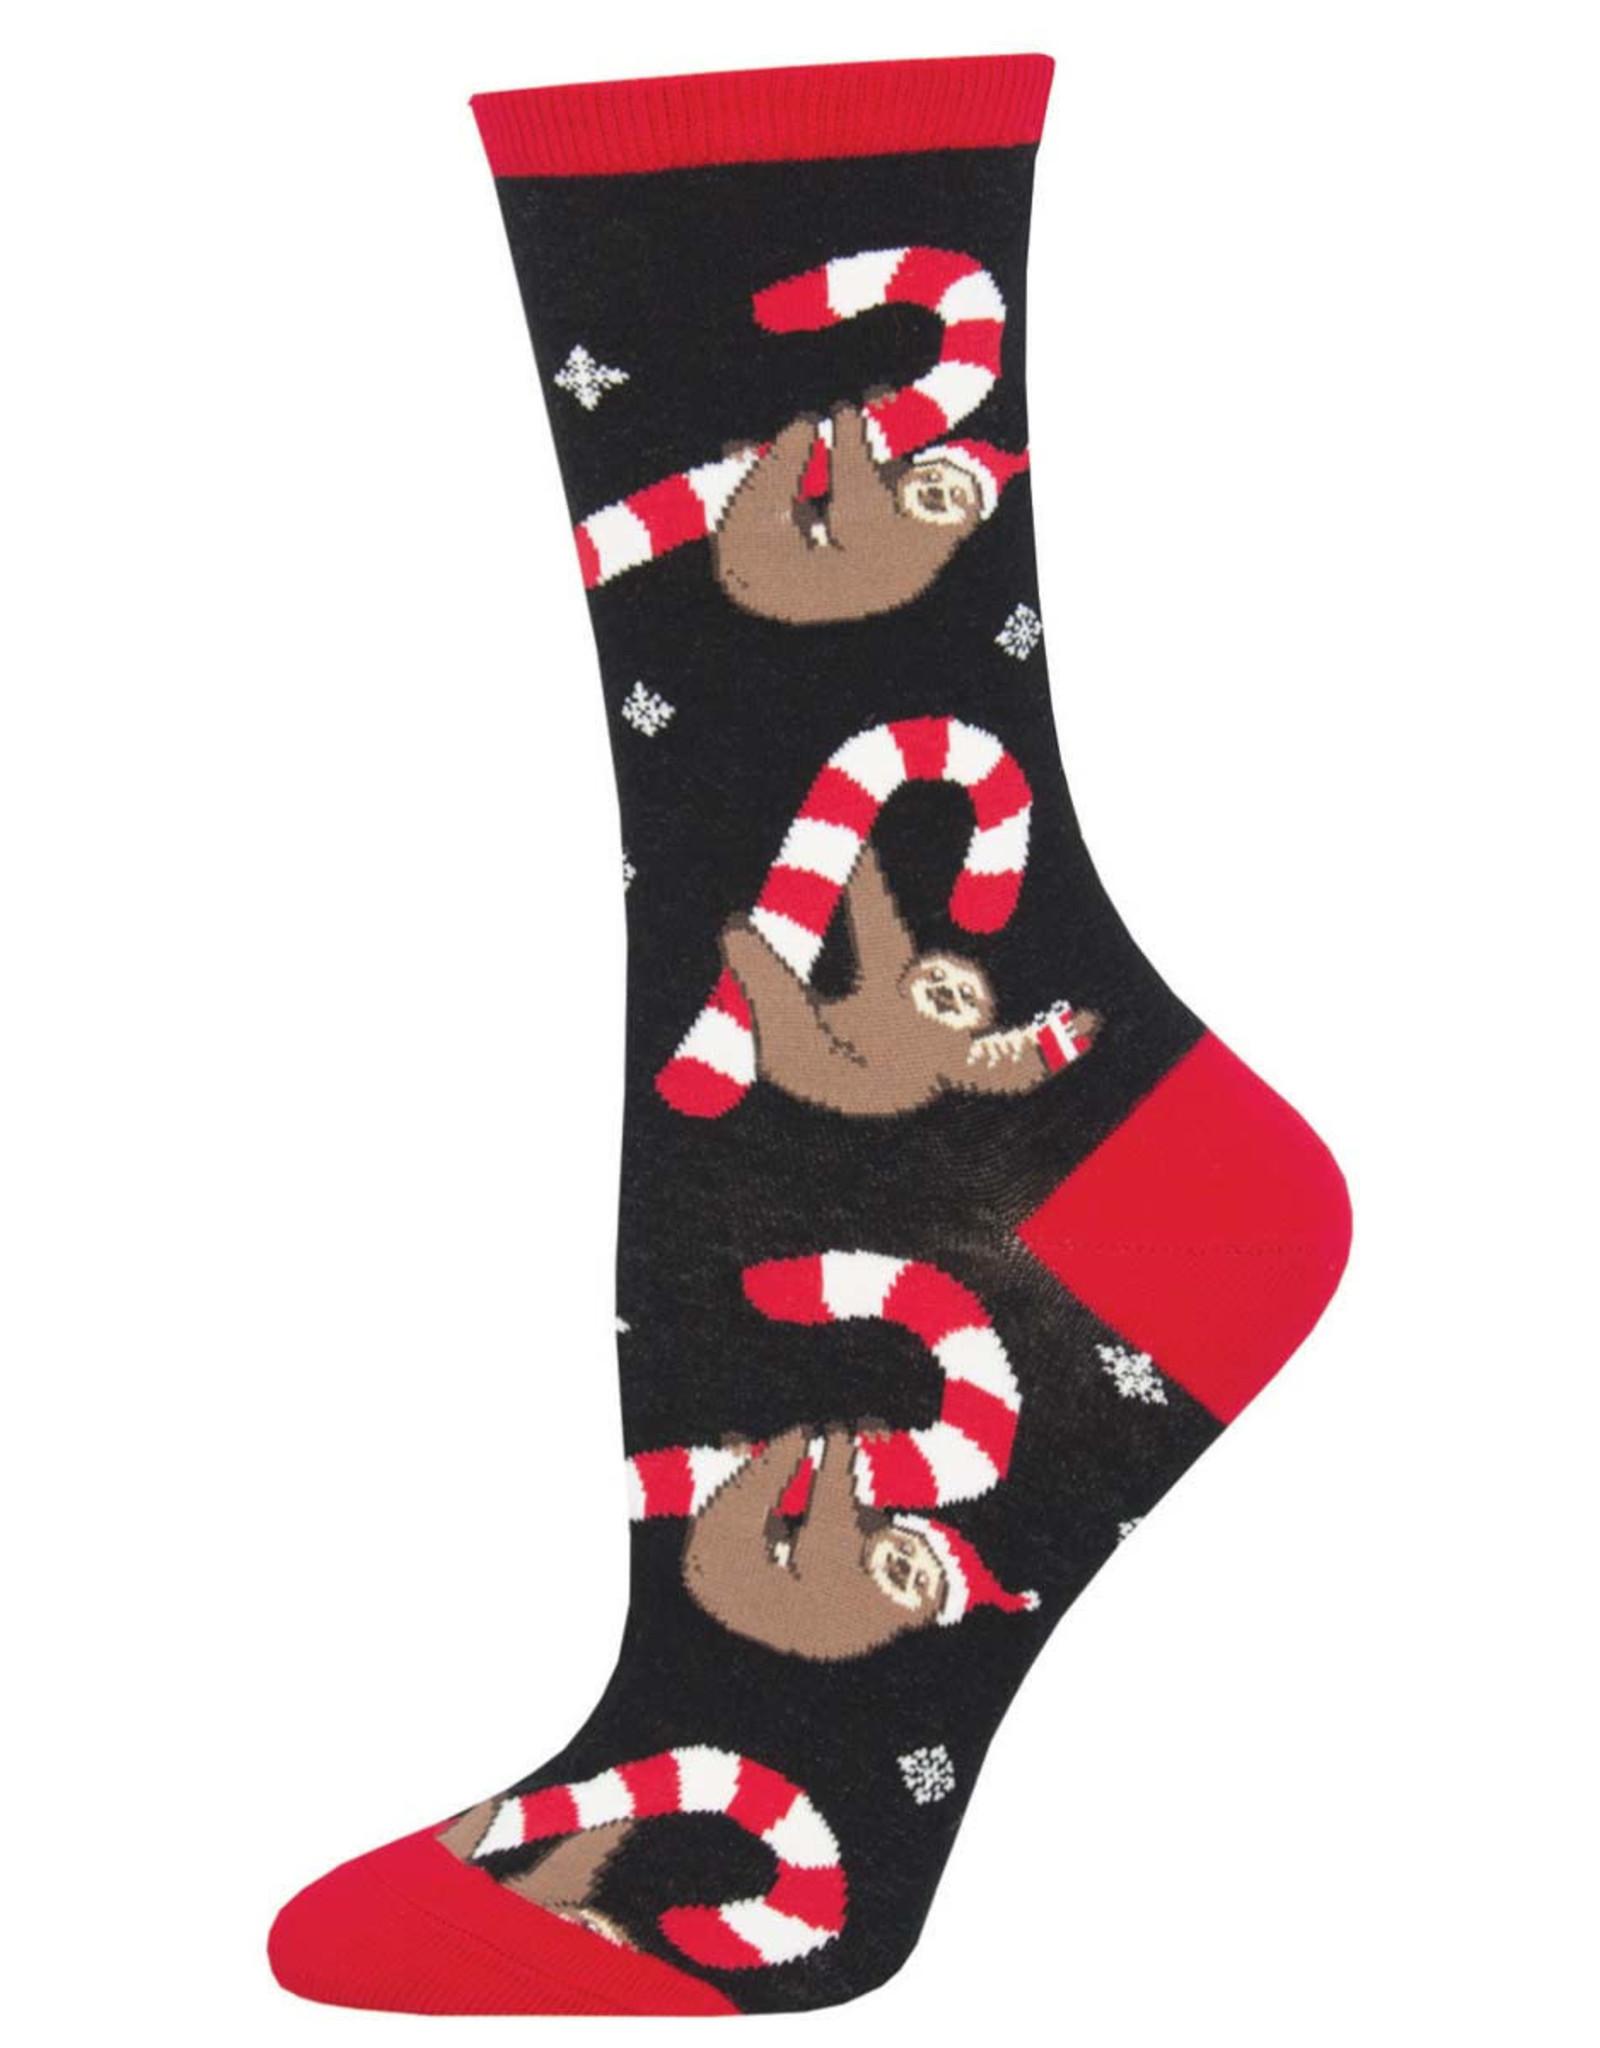 Socksmith Women's Merry Slothmas Black Socks